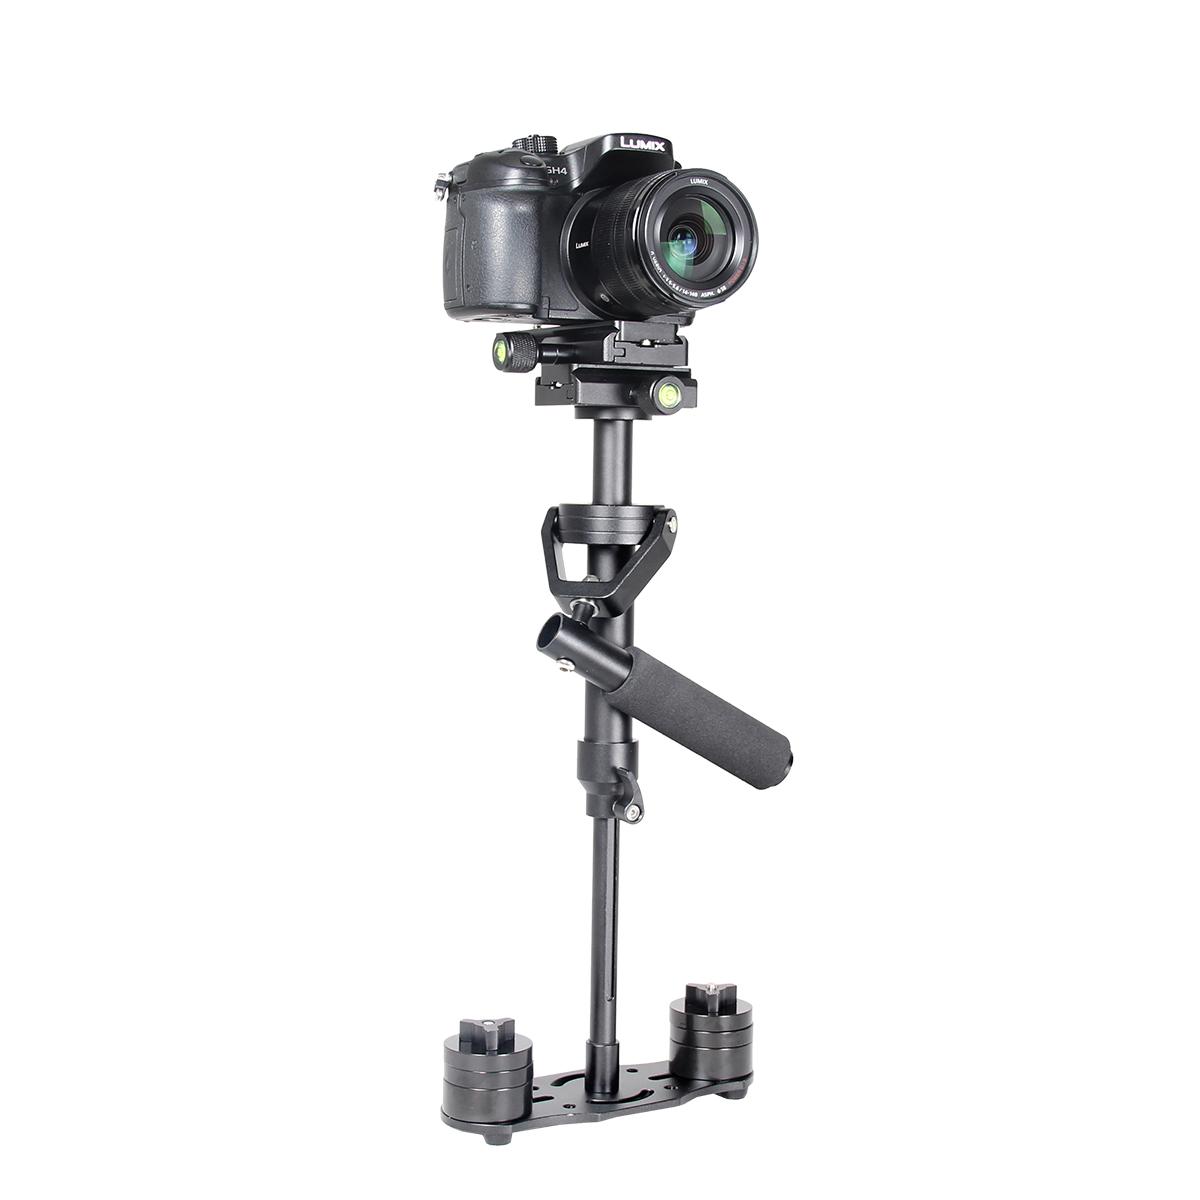 YELANGU Photography Equipment Factory Dslr DV Handheld Steadicam Stabilizer